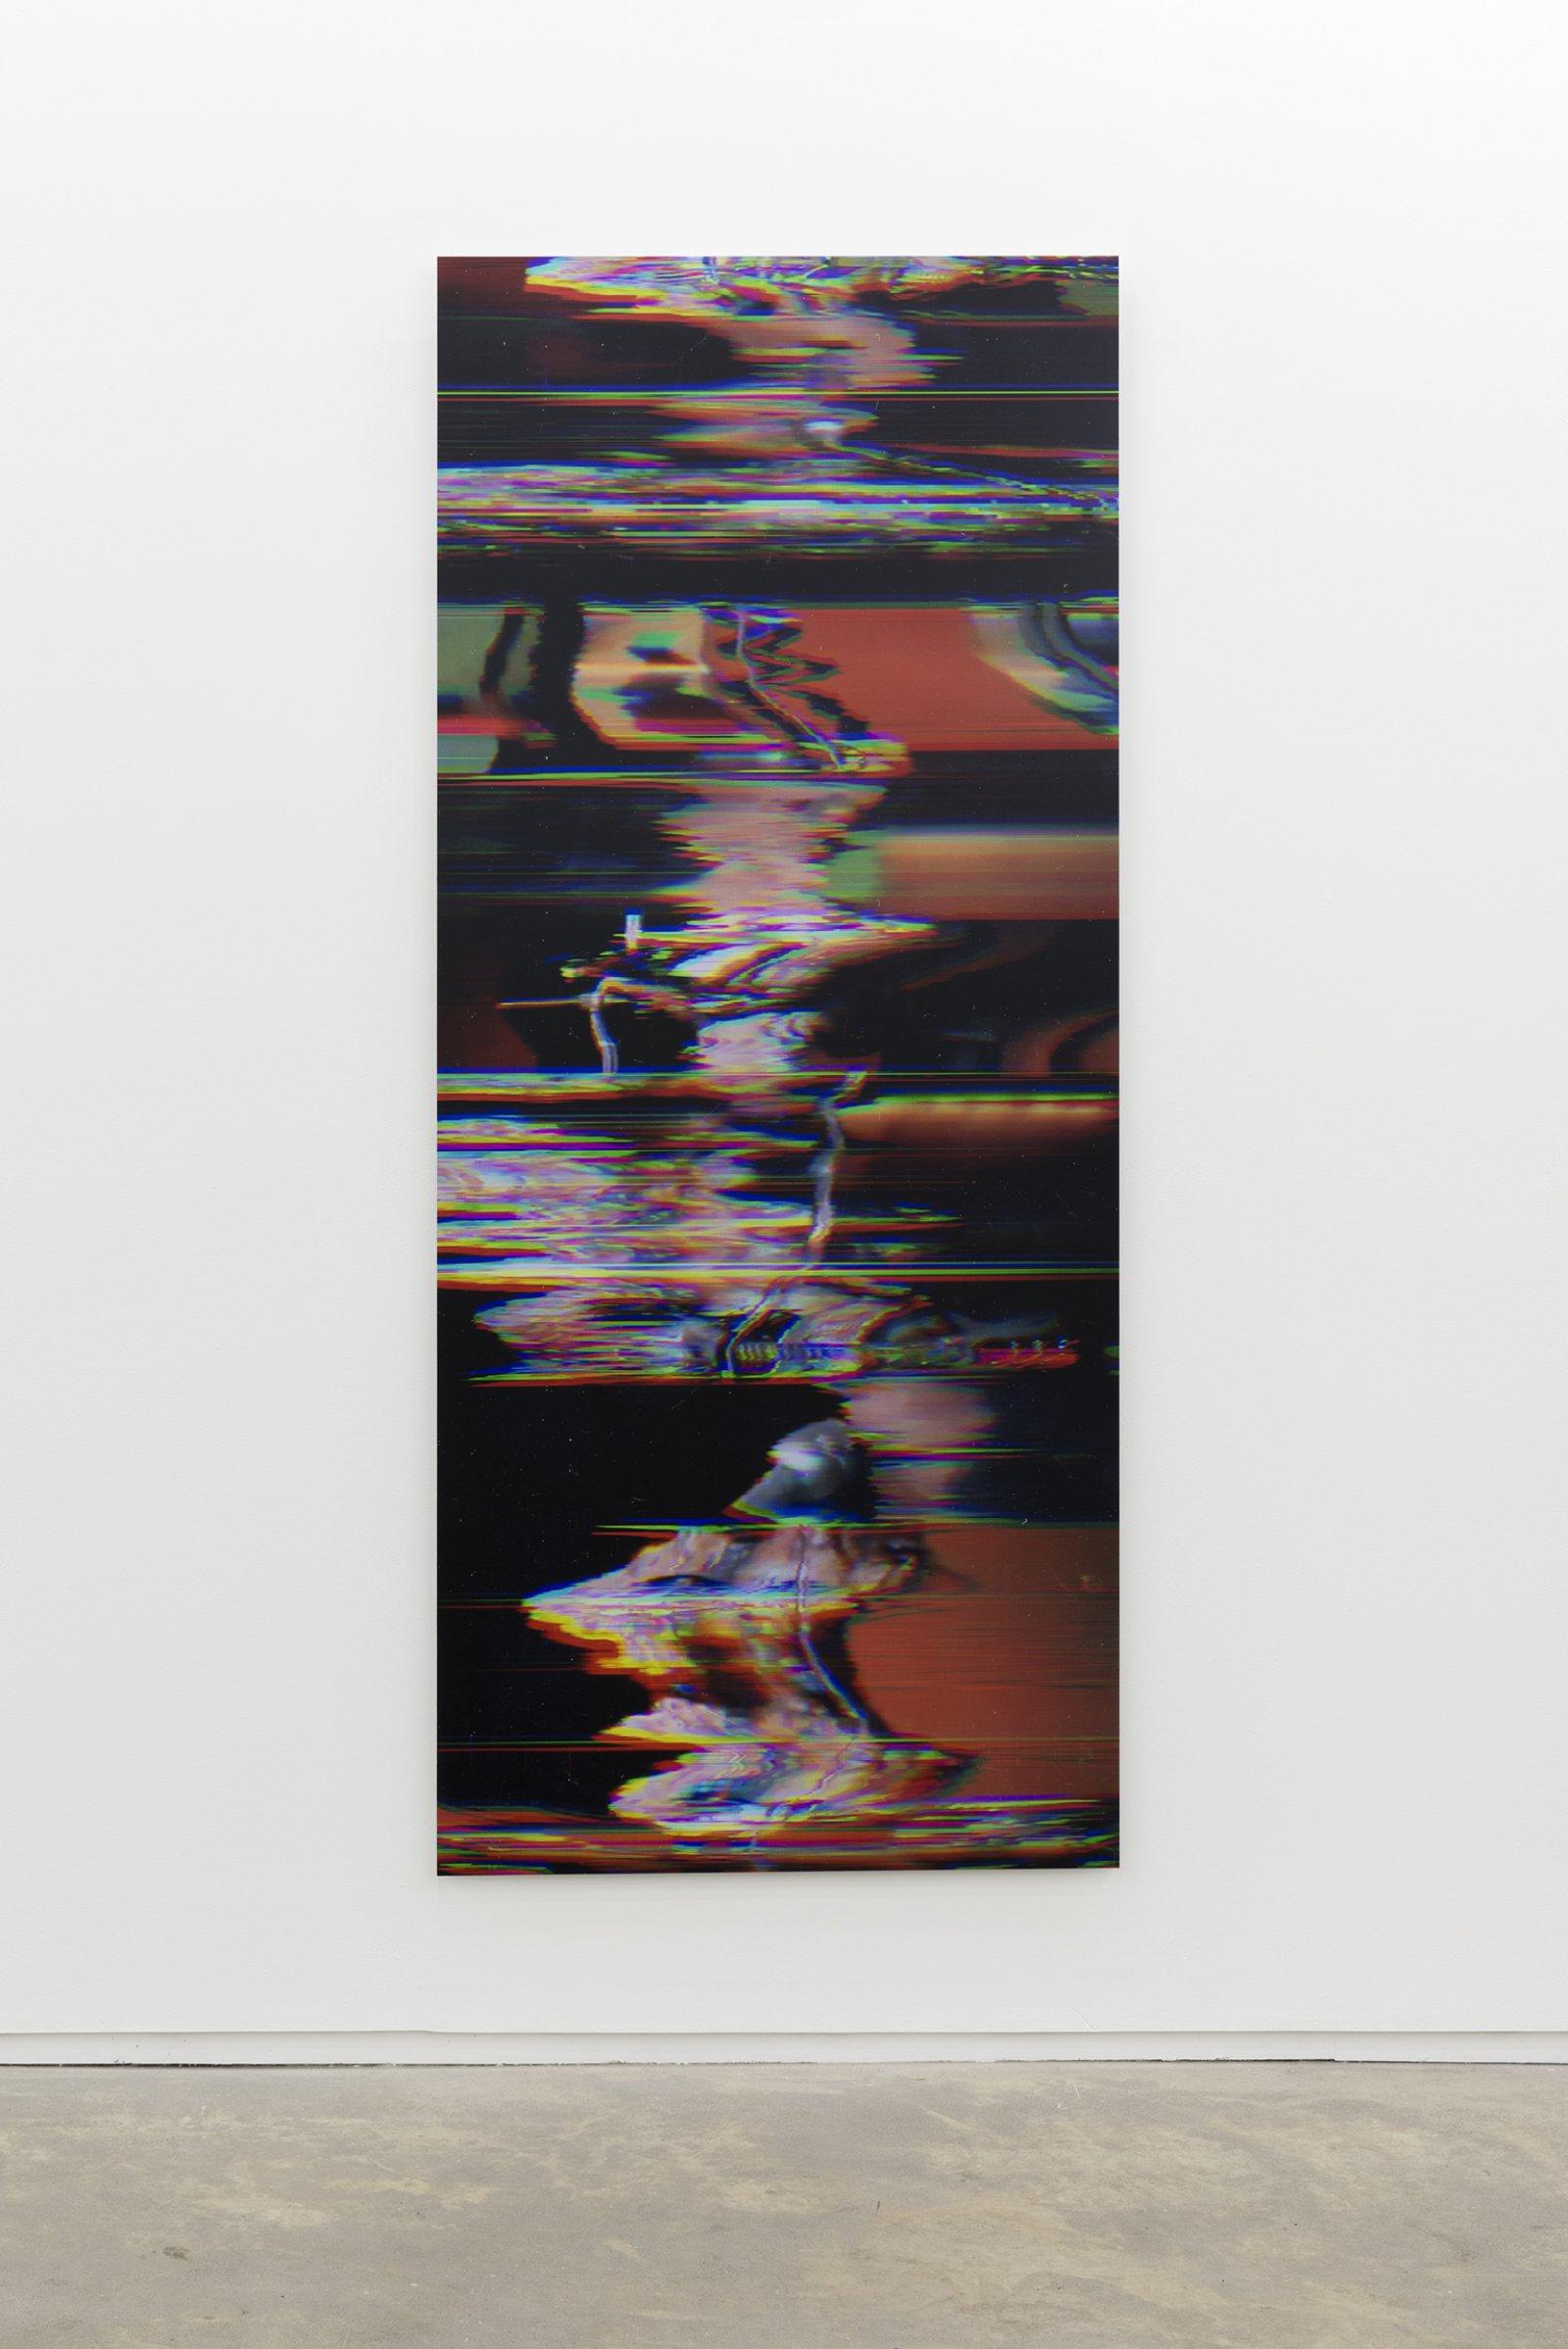 Raymond Boisjoly, Buffy Sainte-Marie (Illumination: 1969/2013) Keeper of the Fire 03, 2013, screen resolution lightjet print mounted on dibond, 96 x 40 in. (244 x 102 cm) by Raymond Boisjoly